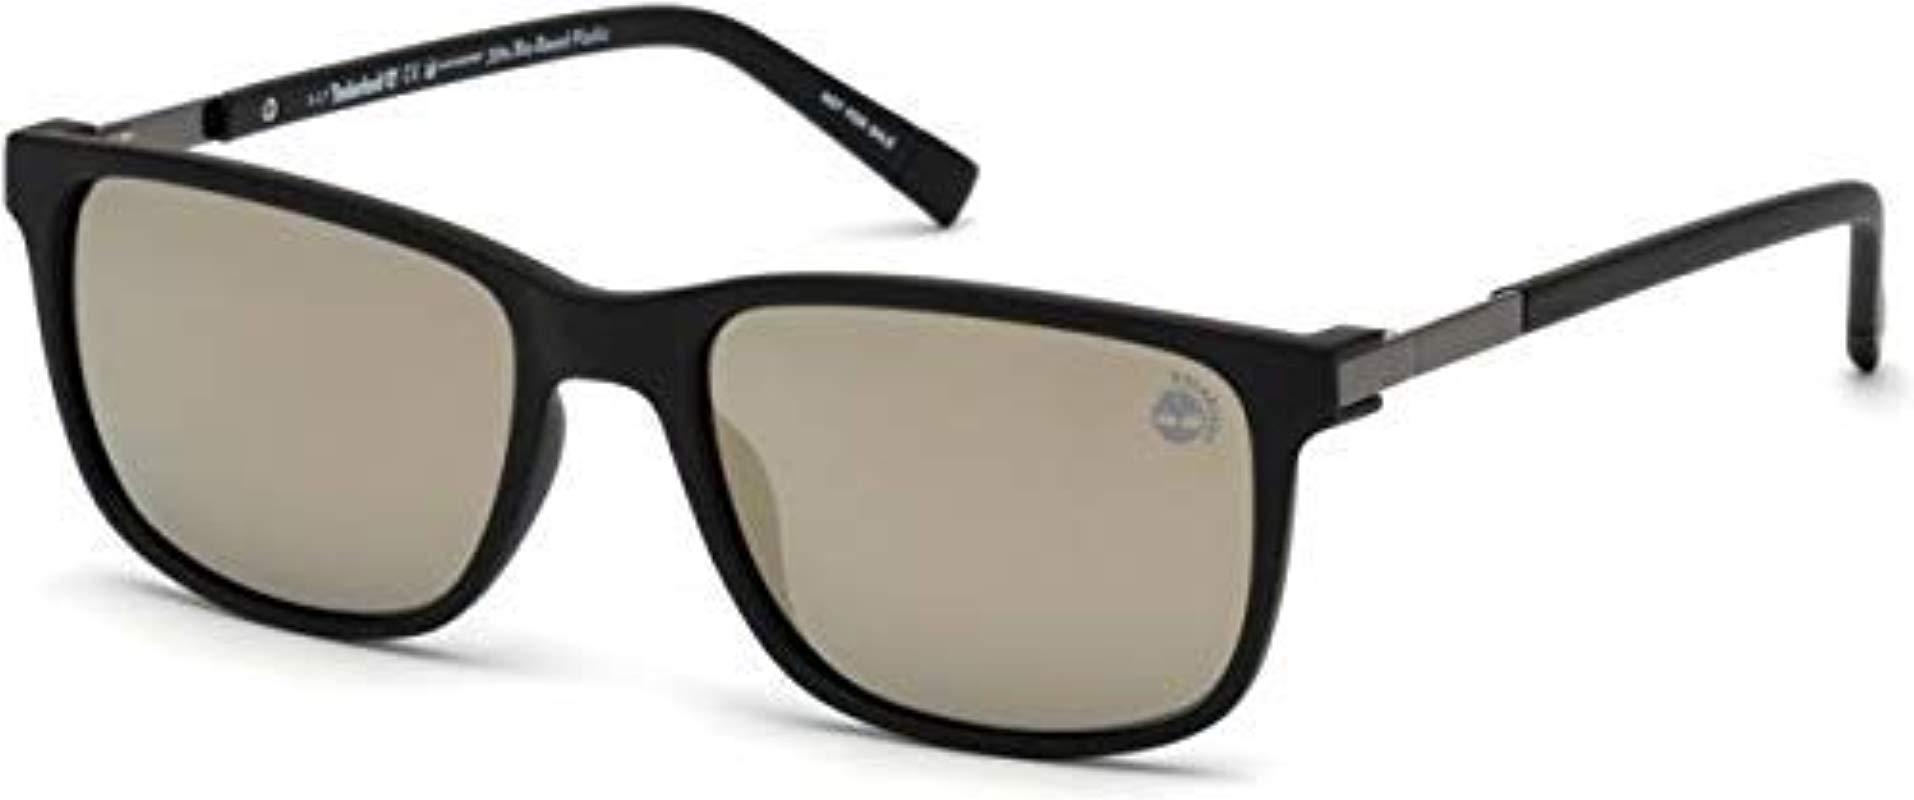 b6429cf541a9 Timberland. Men s  s Tb9152 Sunglasses